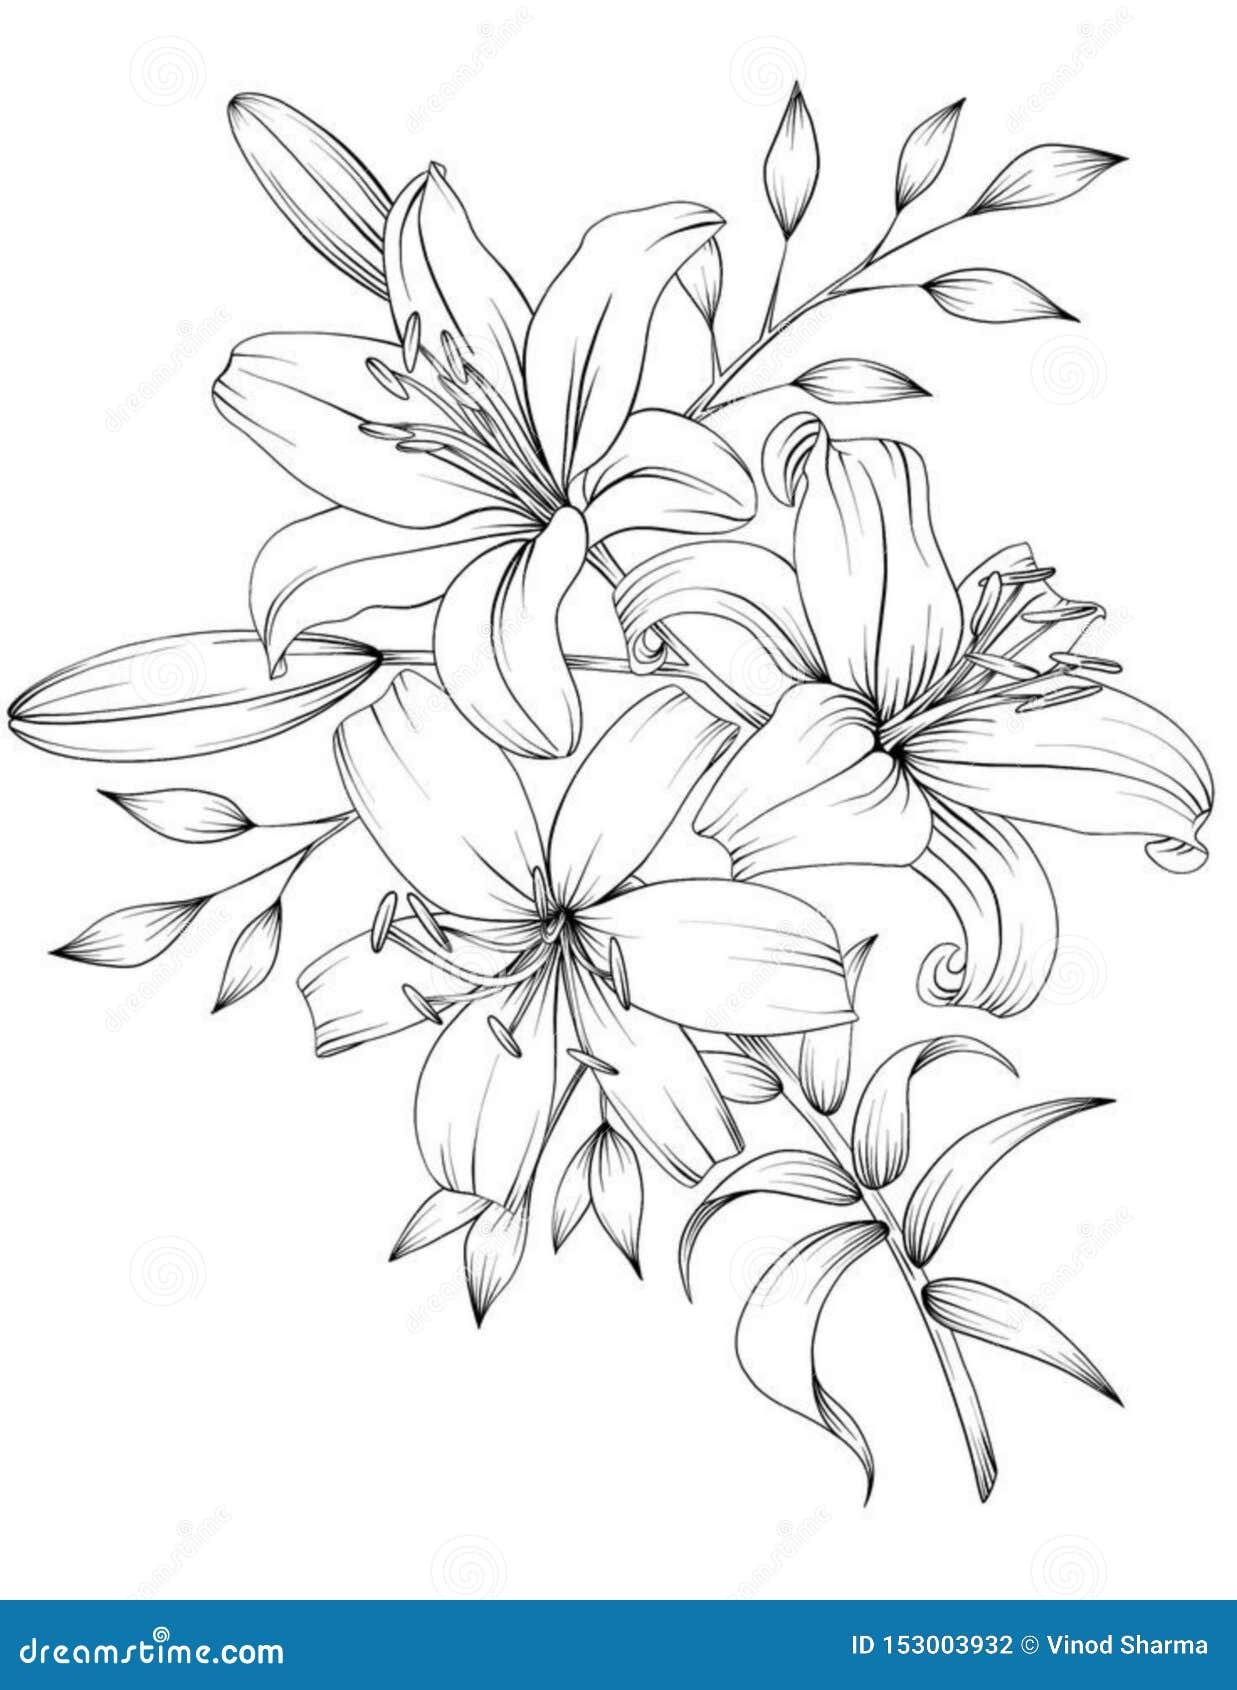 La flor del bosquejo, dibuja a lápiz el arte de la flor